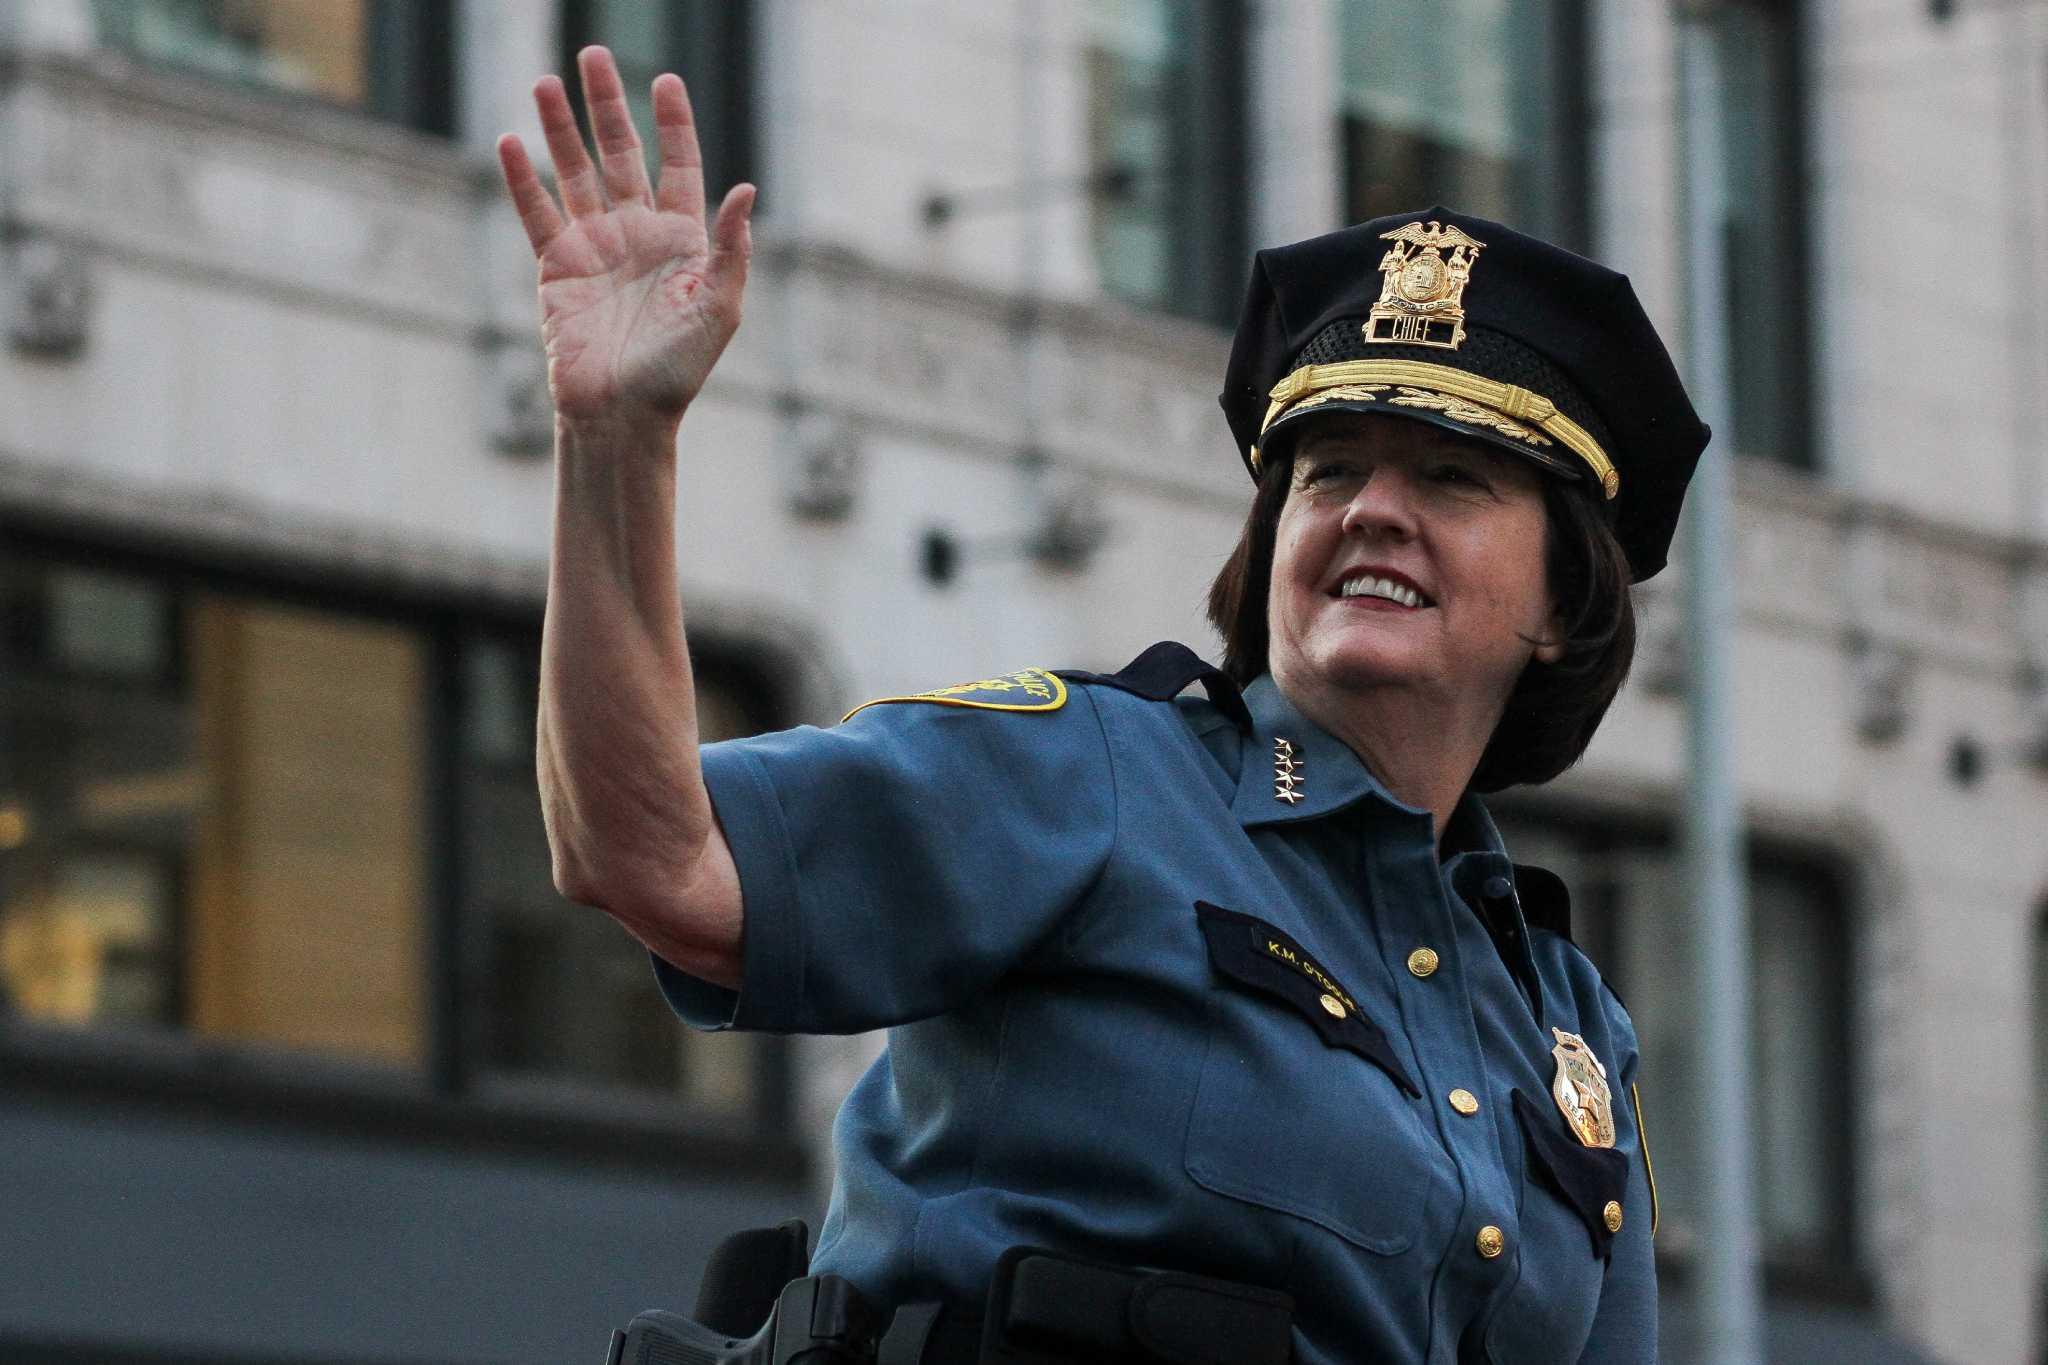 moonlighting seattle cop who sued city gets  45k  meeting